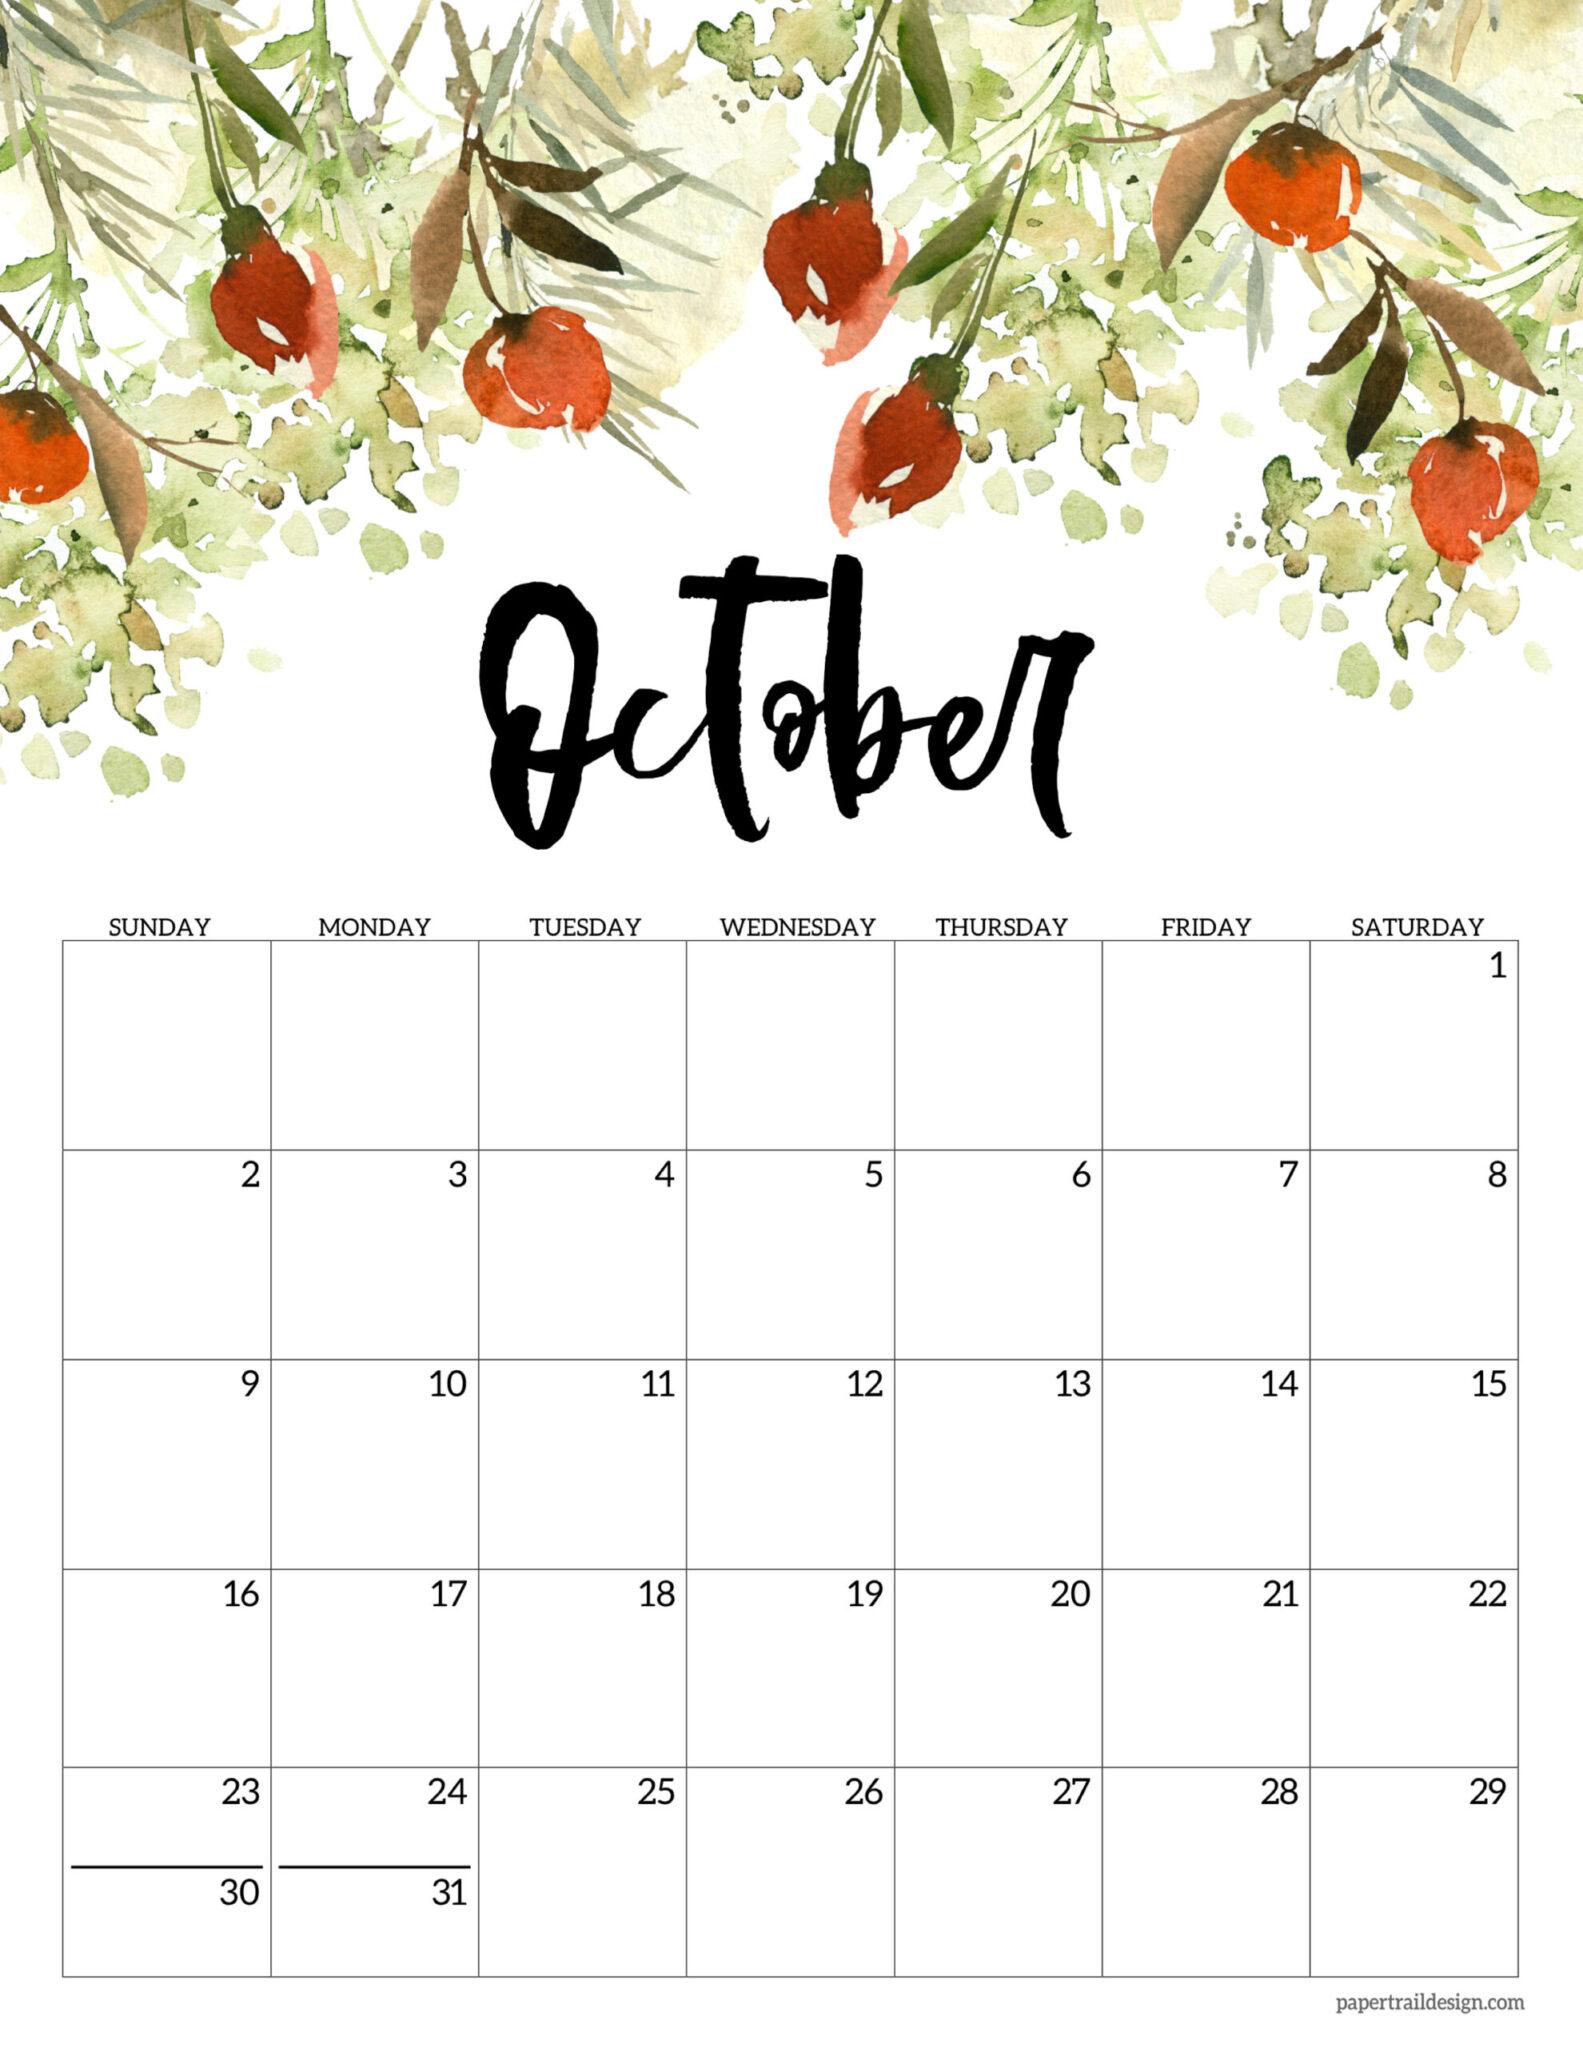 Free 2022 Calendar Printable - Floral | Paper Trail Design For Calendar 2022 February Floral